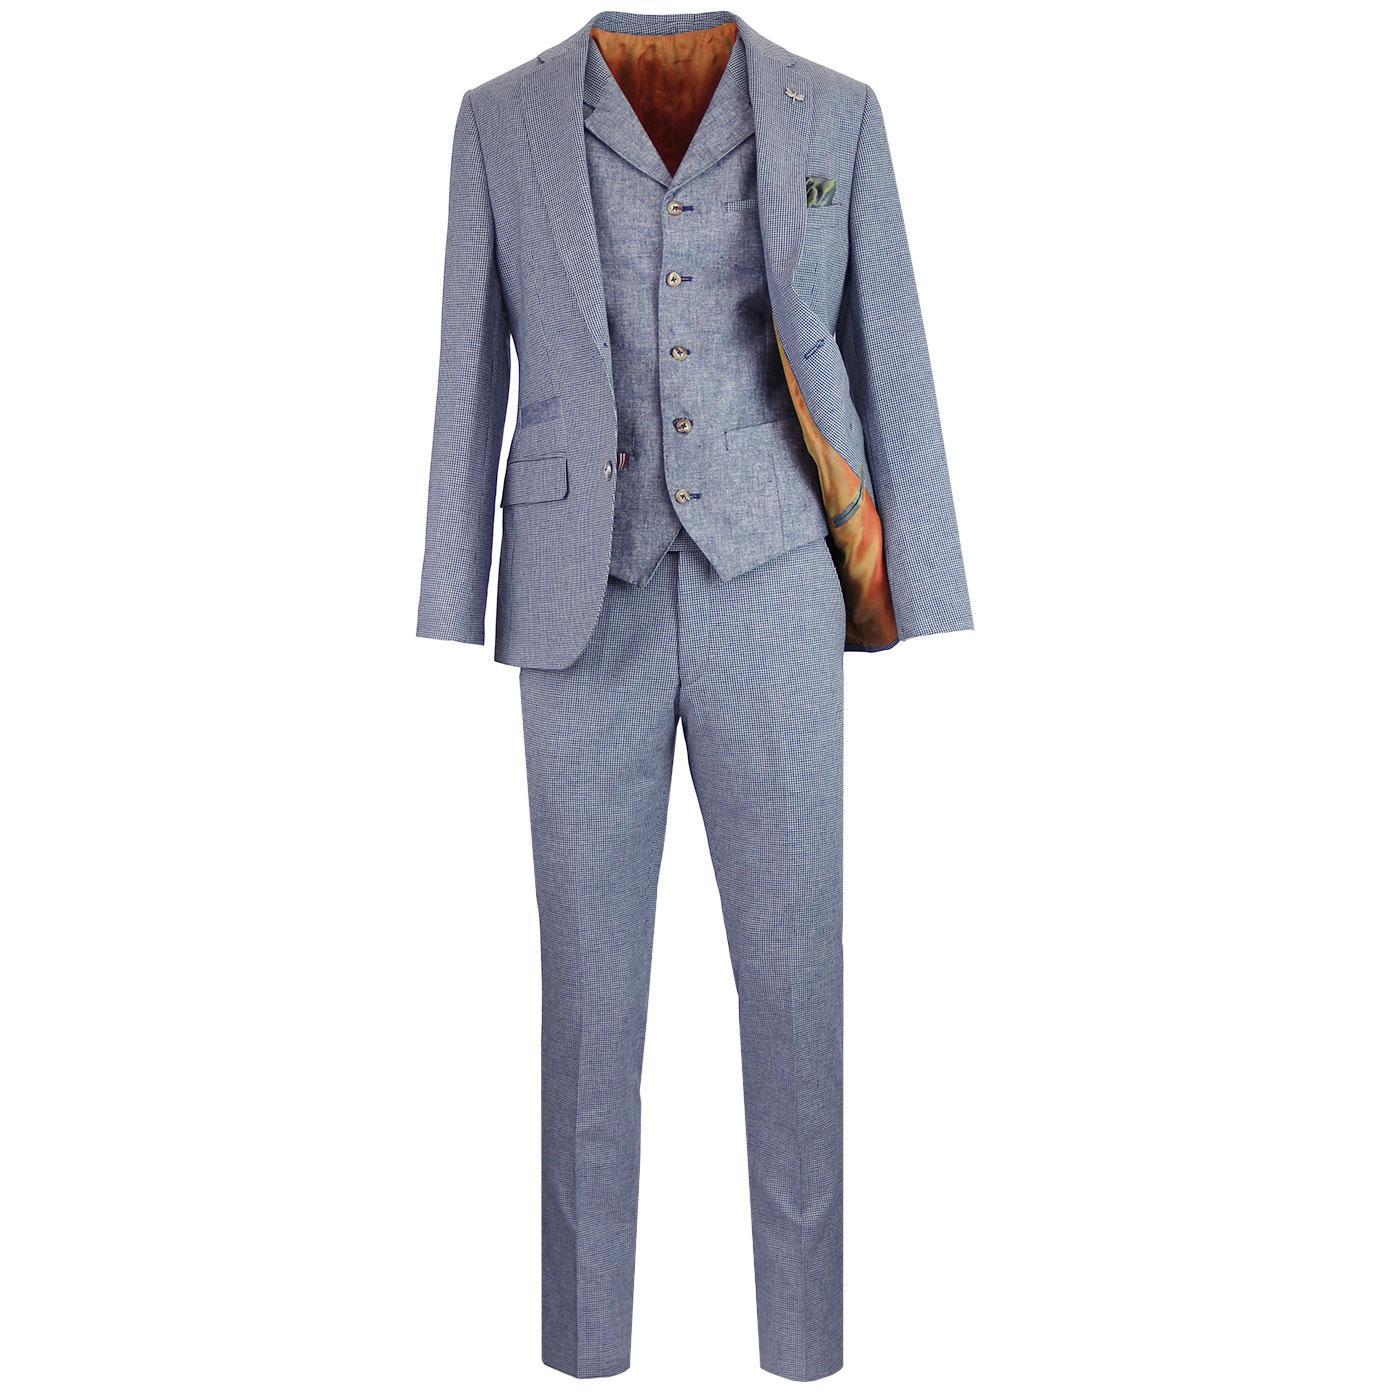 GIBSON LONDON Mod Check Suit & Linen Waistcoat